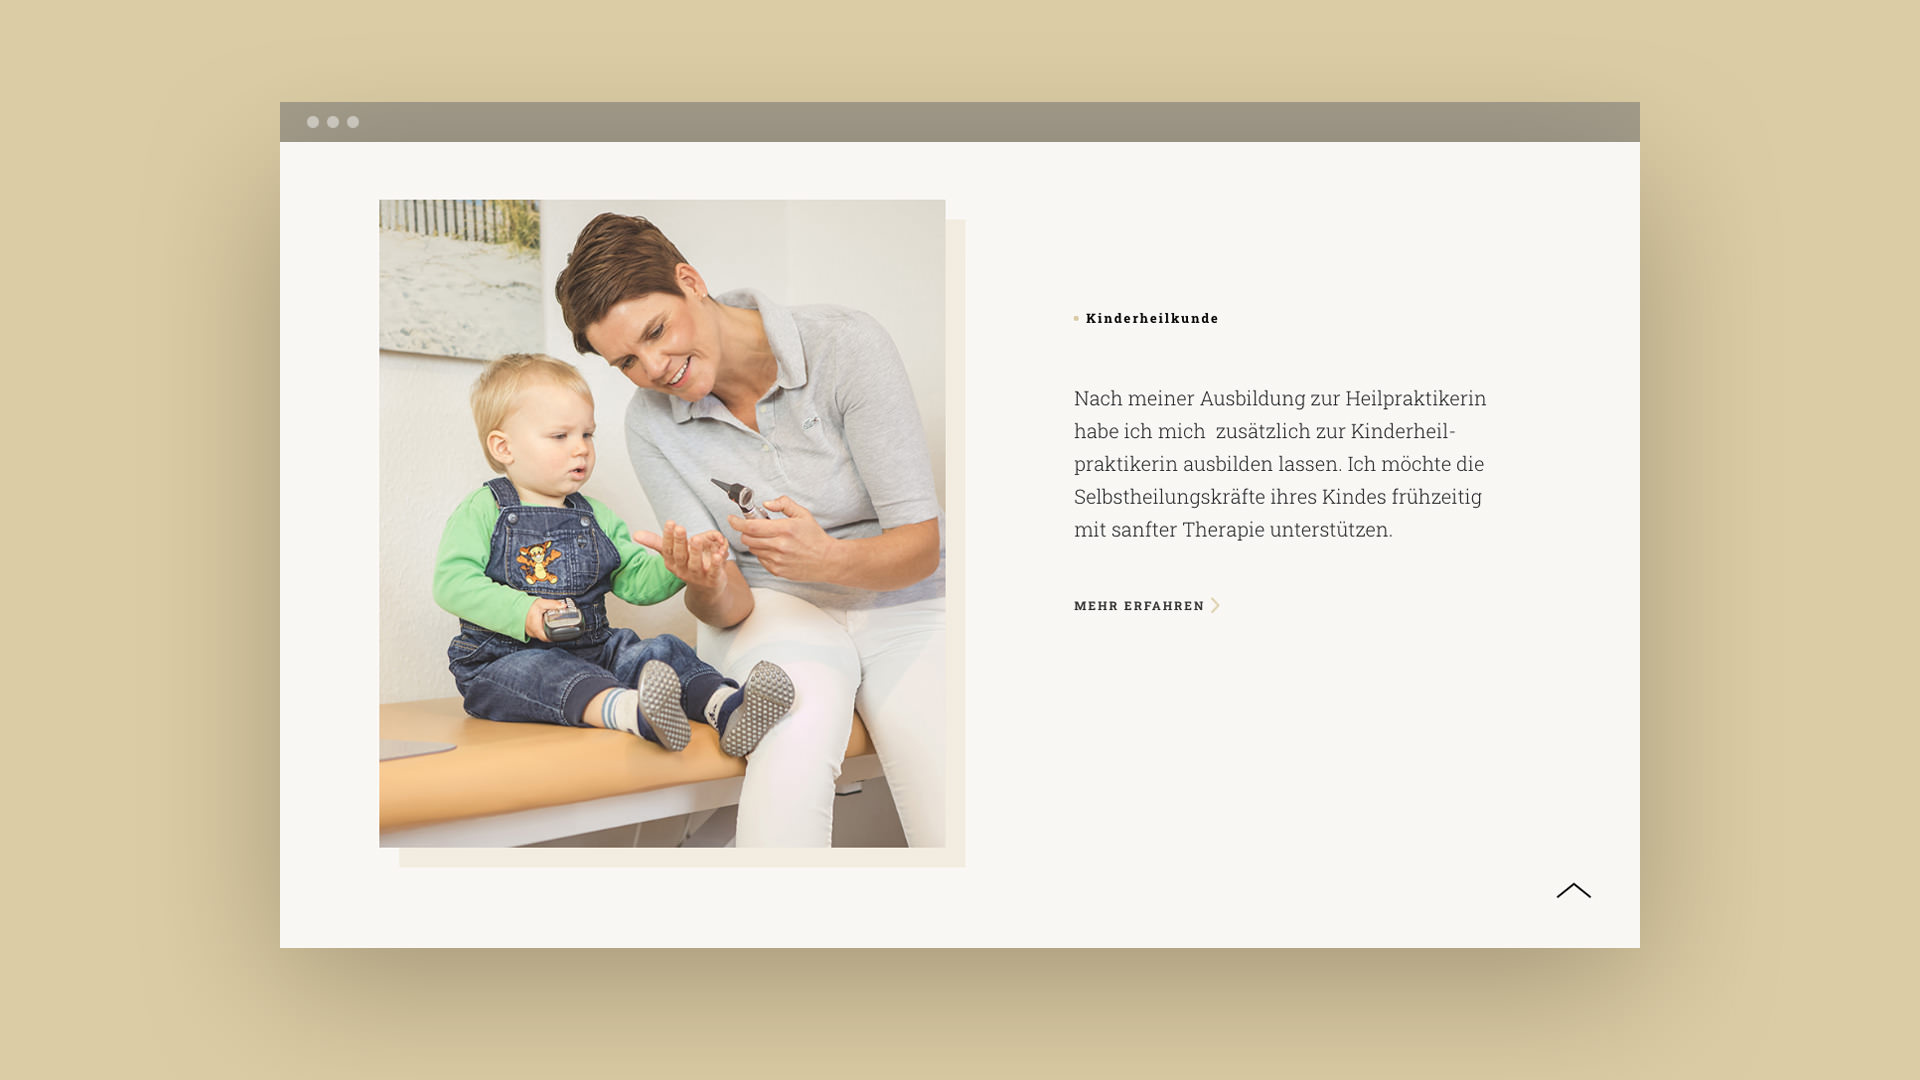 geniacs-werbeagentur-muenster-webdesign-cover-naturheilkundepraxis-volbers-detail-2